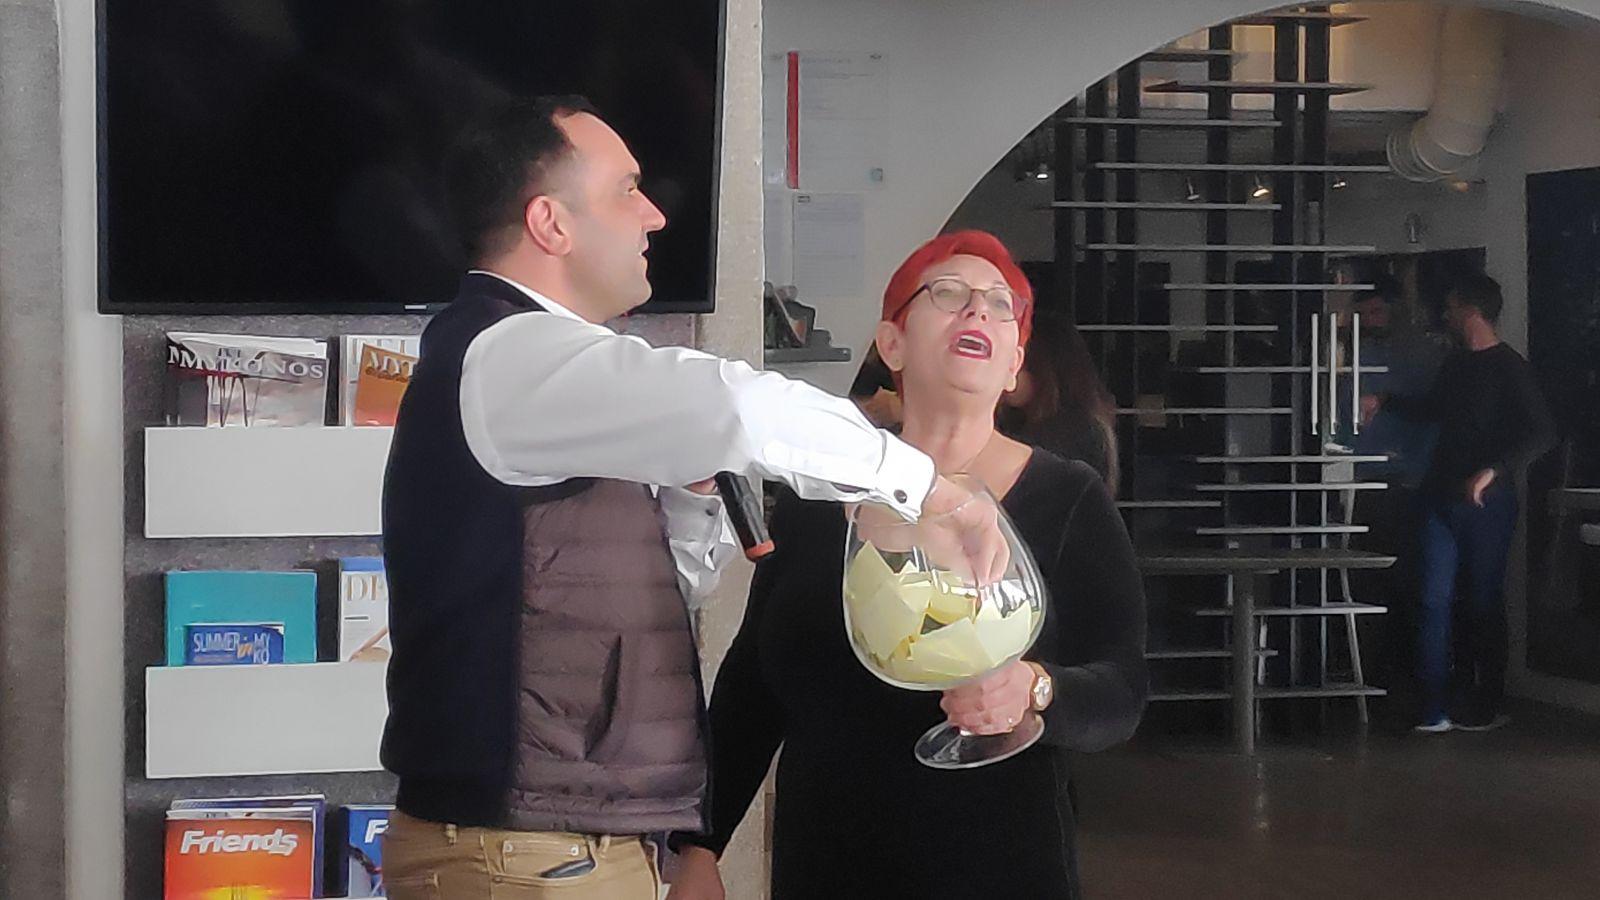 (video) Πρόεδρος Συλλ. Γυναικών προς Κων/νο Κουκά «Είσαι ο τυχερός μας Δήμαρχος!»